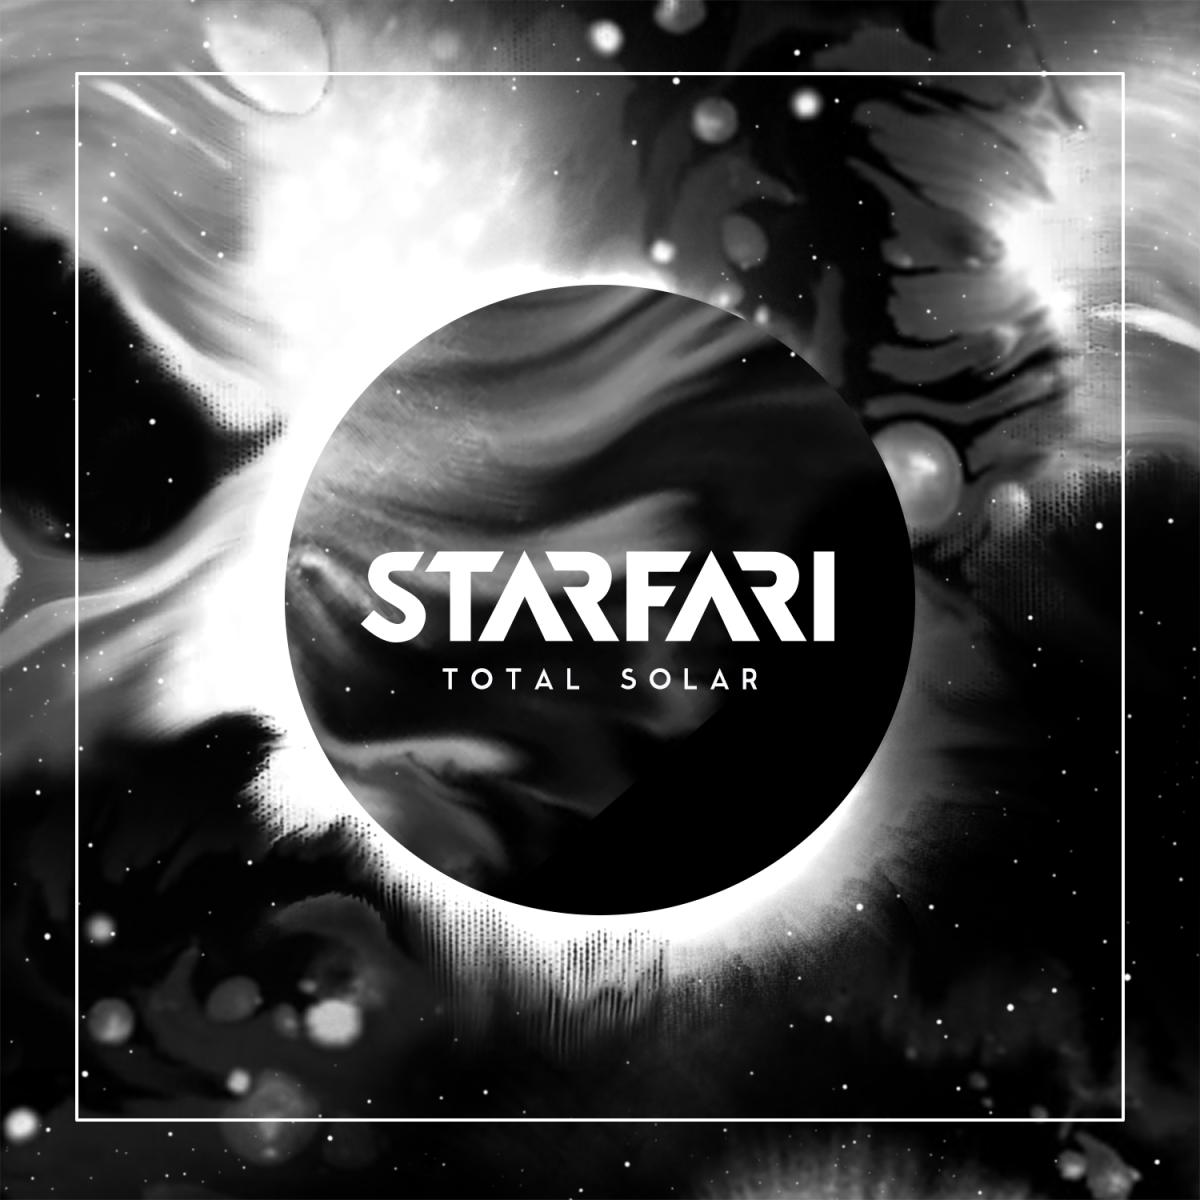 starfari-total-solar-ep